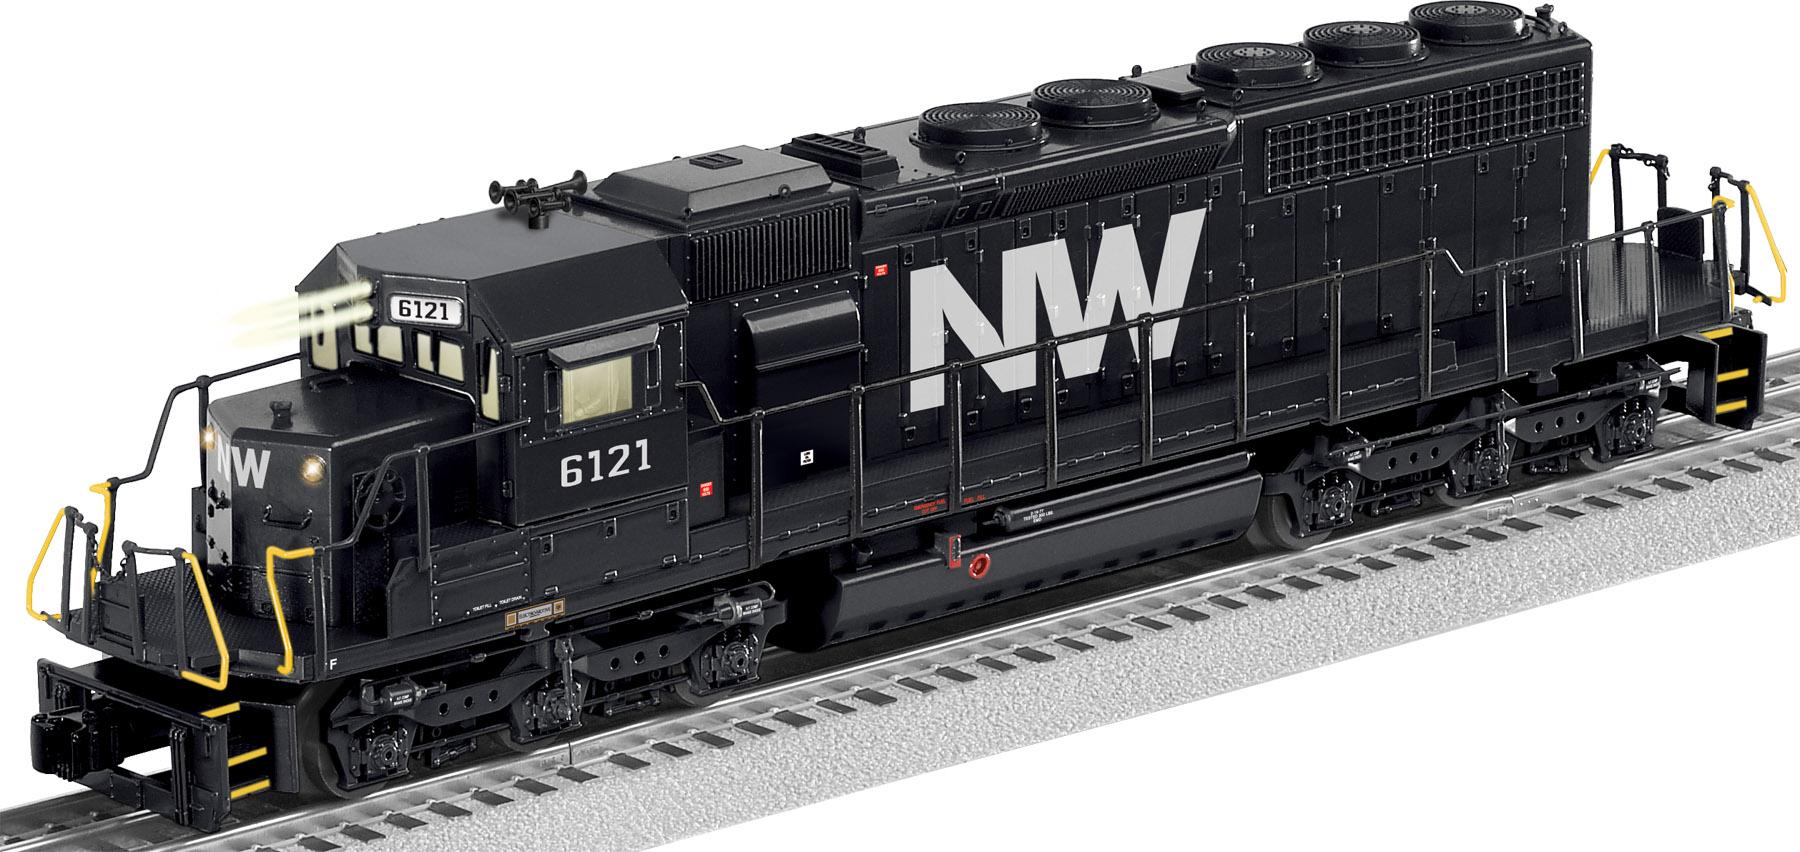 Kind-Hearted Ho Scale Santa Fe Offset Side 2 Bay Hopper Rtr Easy To Repair Toys & Hobbies Model Railroads & Trains